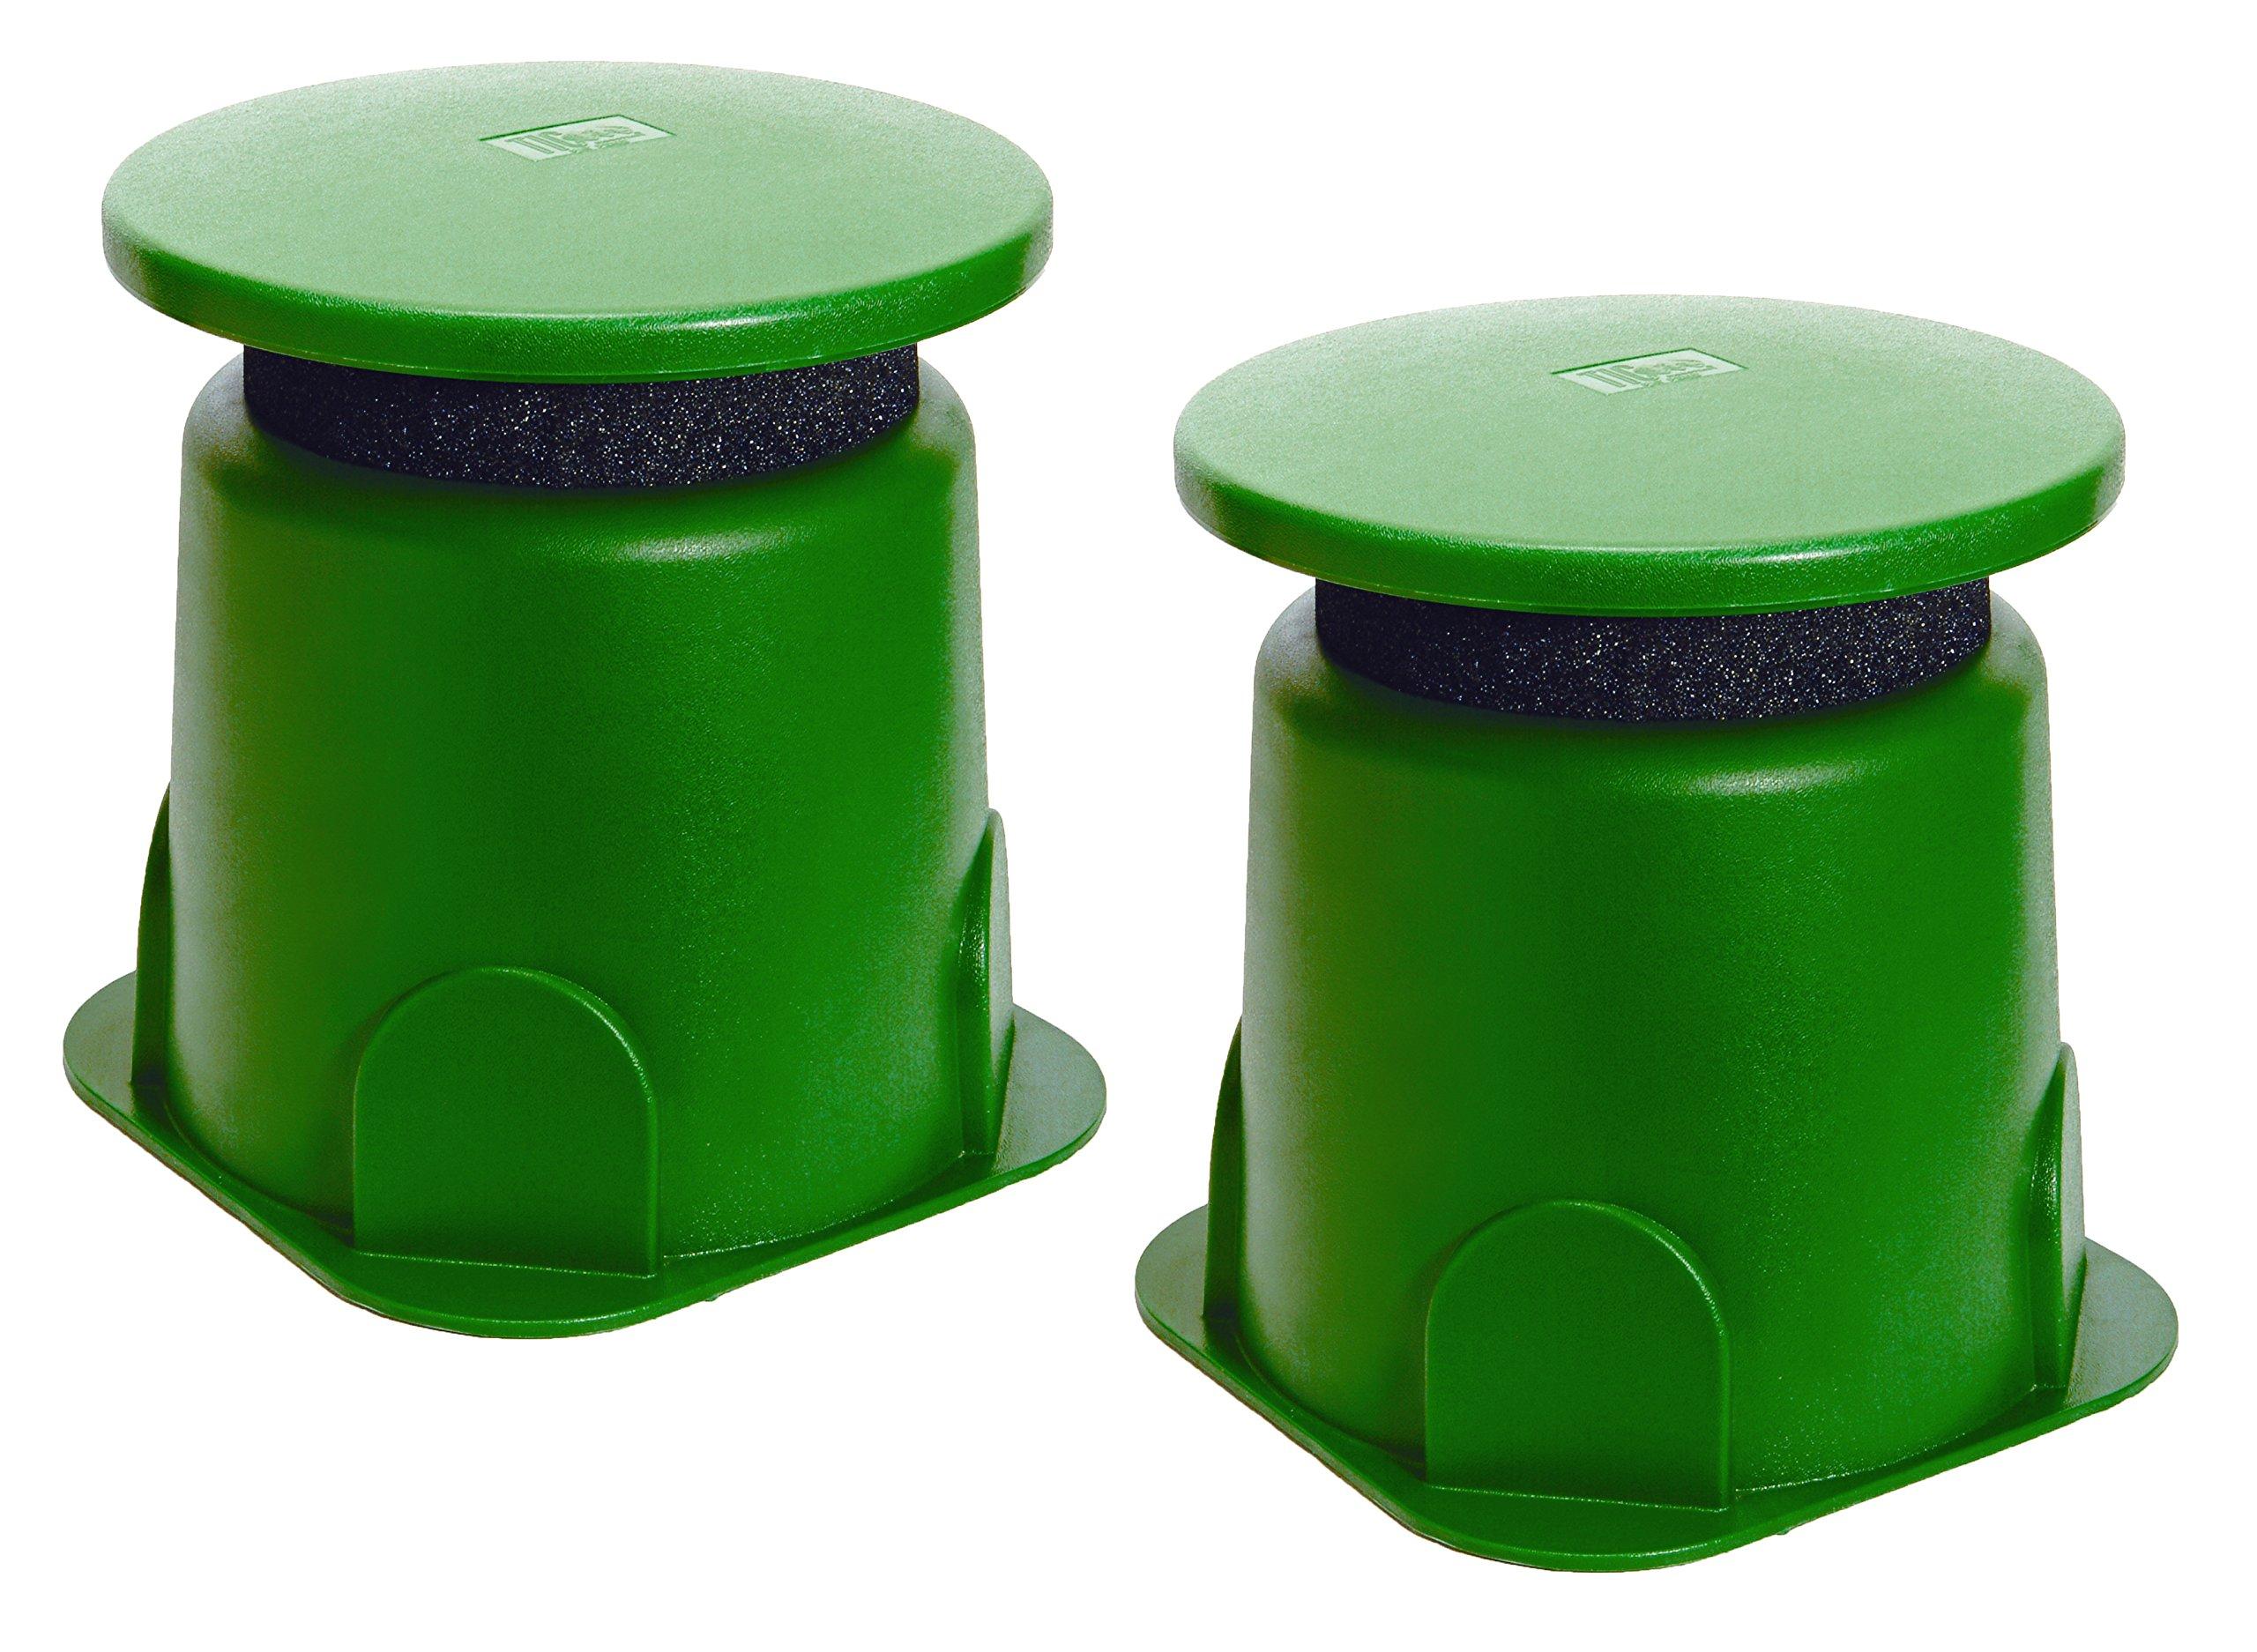 TIC GS5 Mini Outdoor In-Ground Omni-Directional Speakers (Pair)